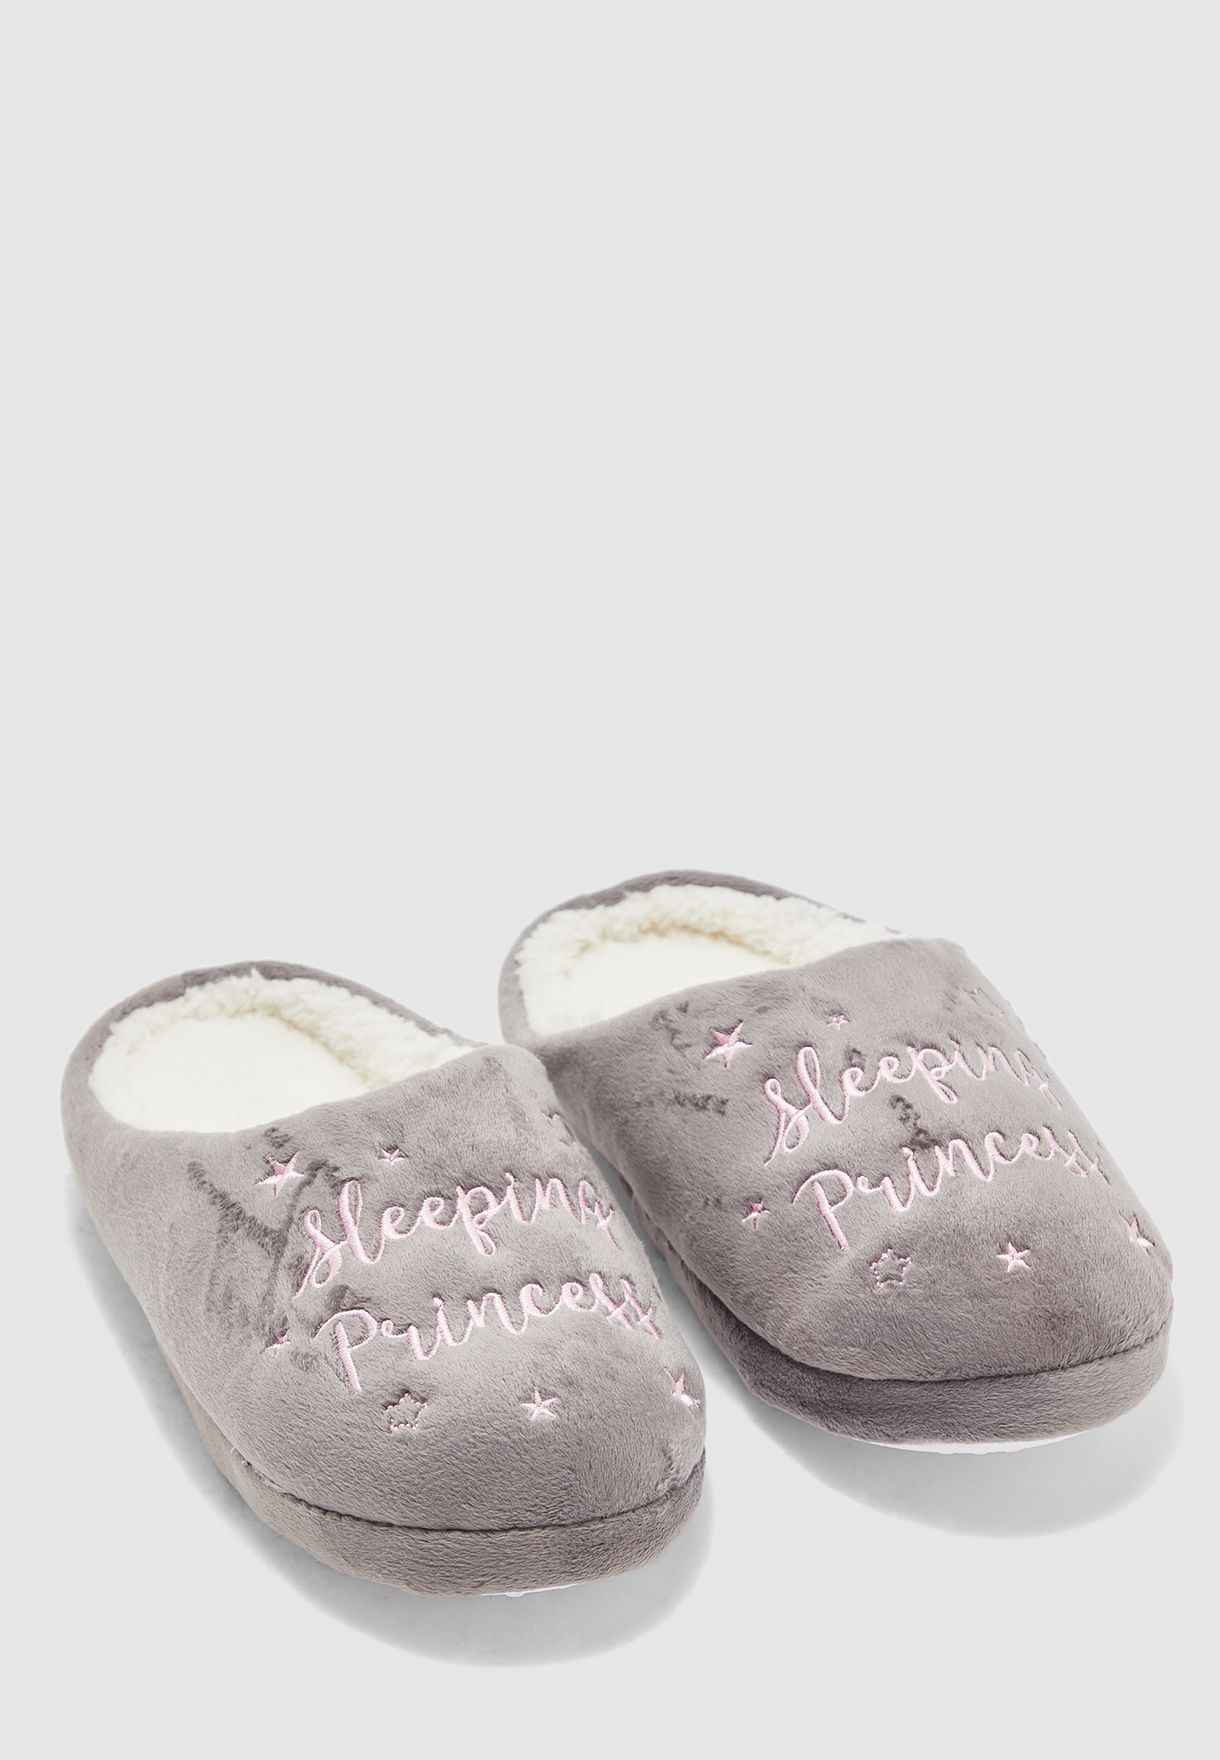 Slogan Slippers